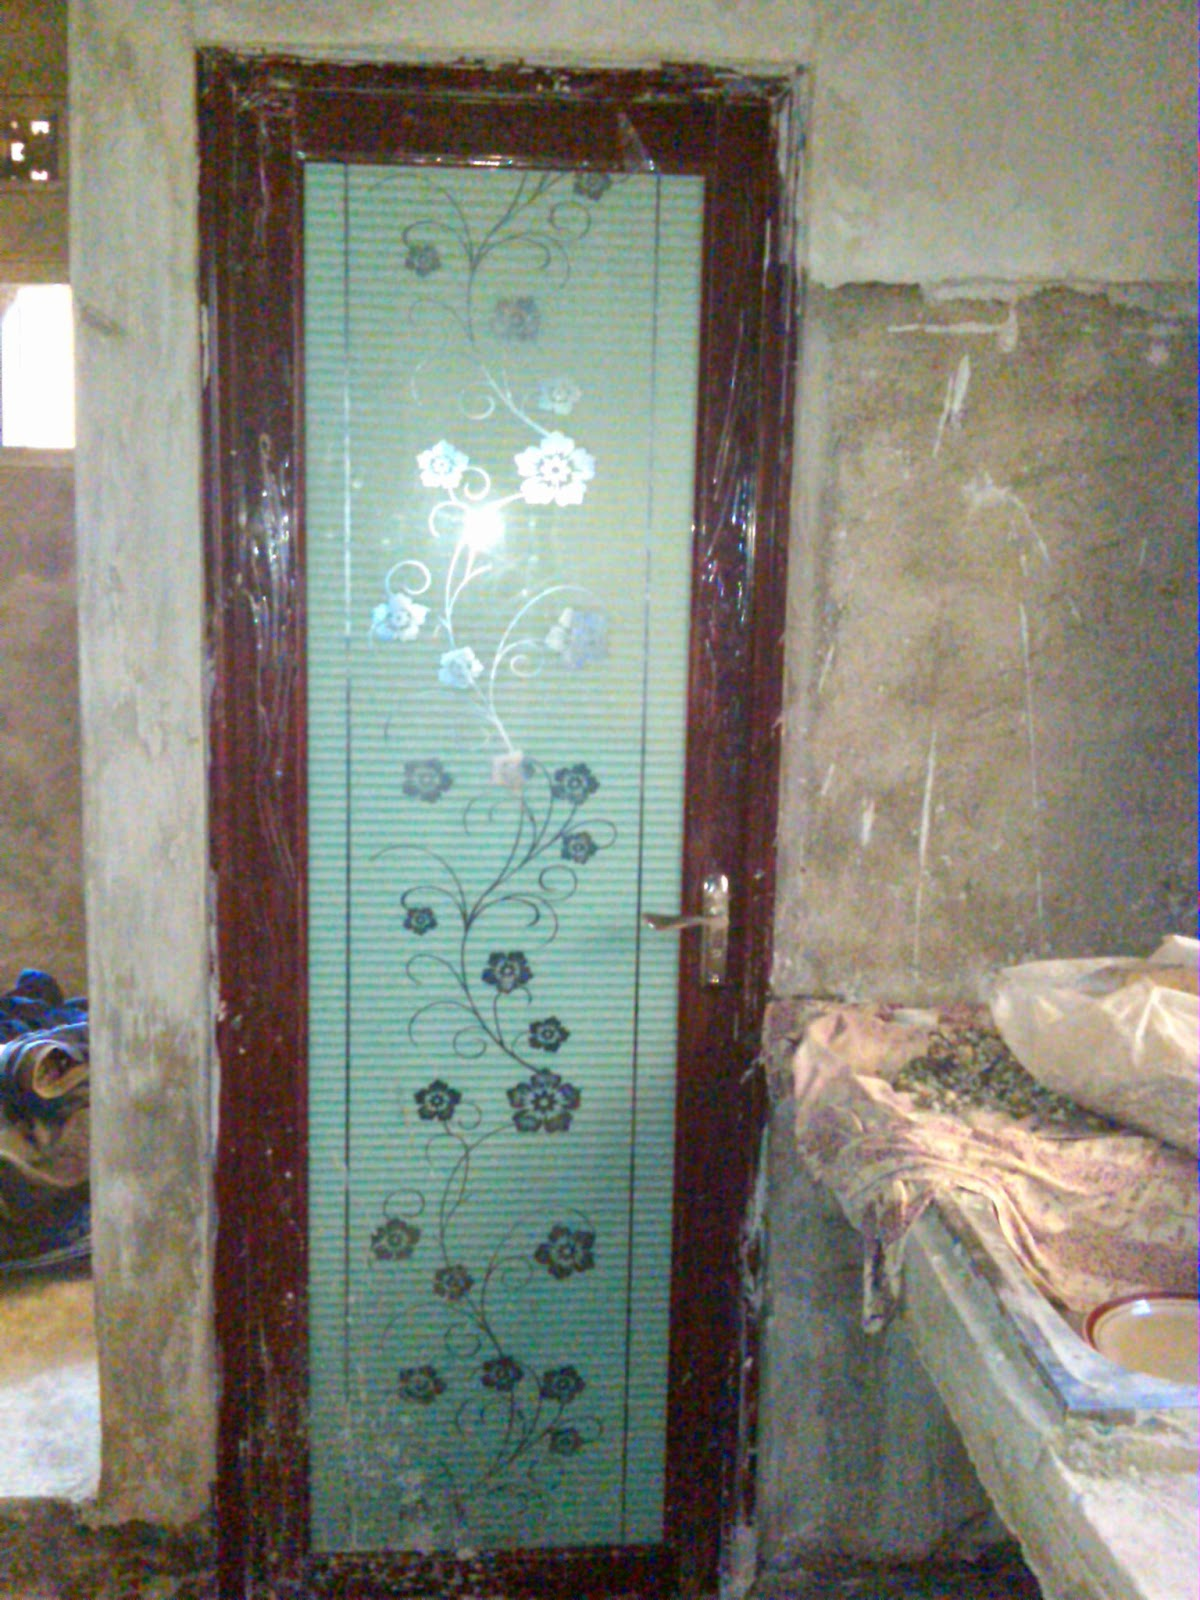 contoh gambar pintu kamar mandi yang baru saja dipasang